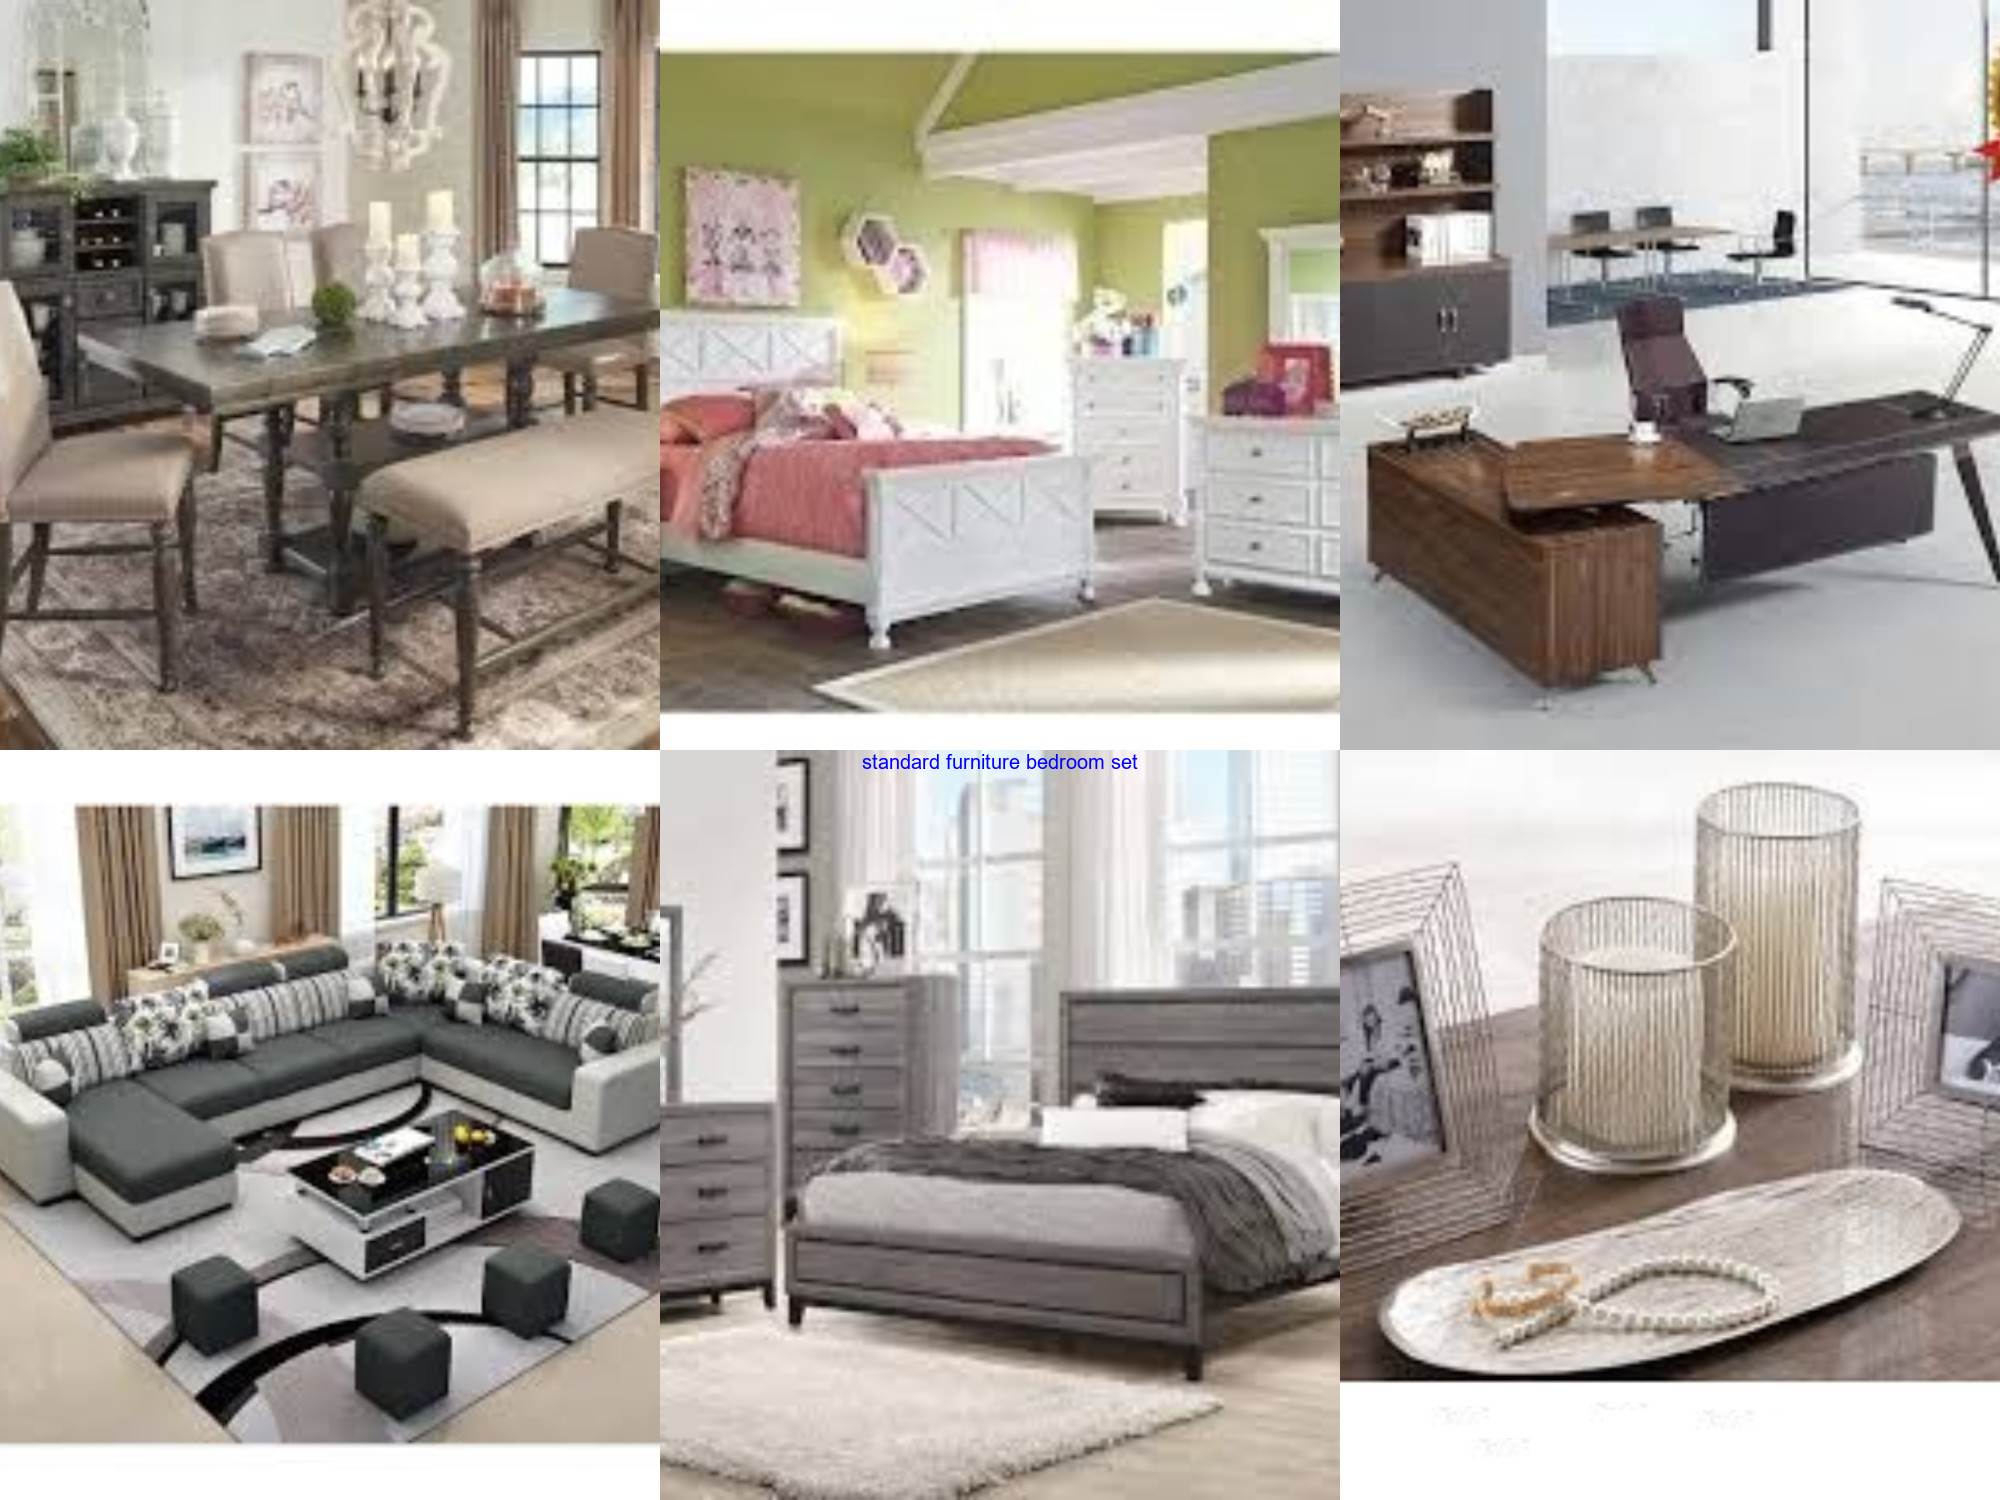 Standard Furniture Bedroom Set Furniture Prices Furniture Reviews Furniture